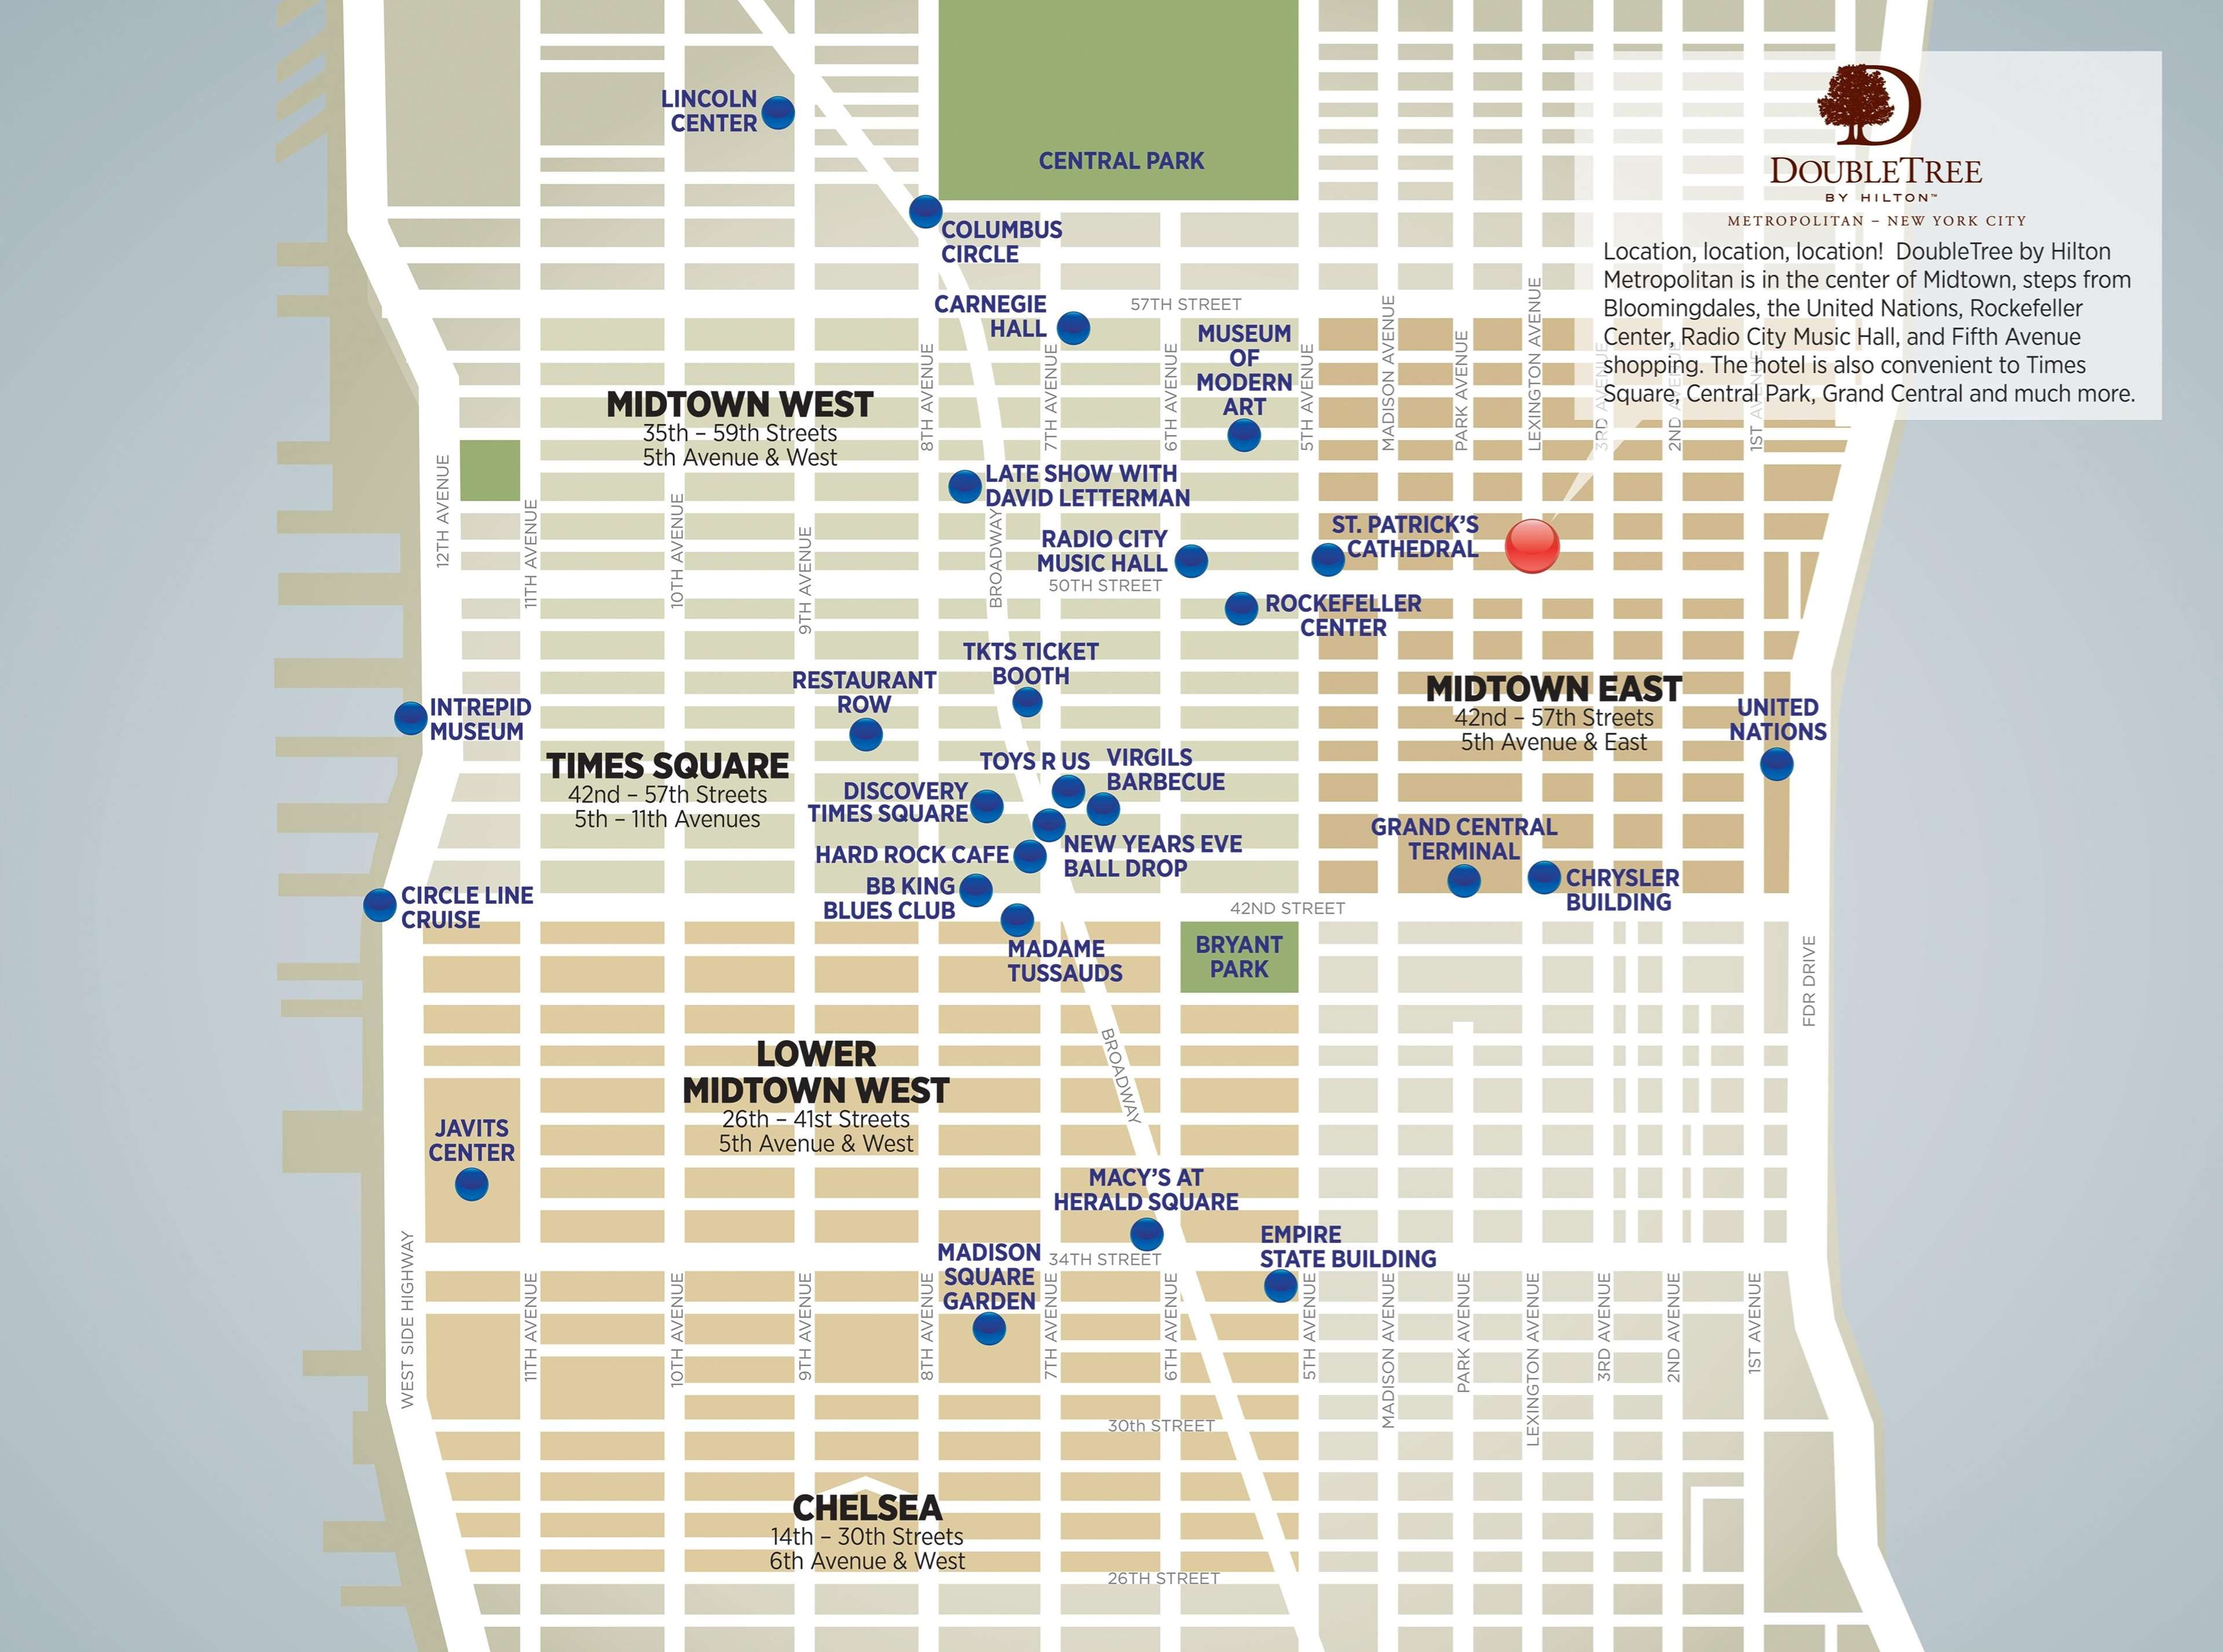 Doubletree by hilton hotel metropolitan new york city for Modern hotels near me